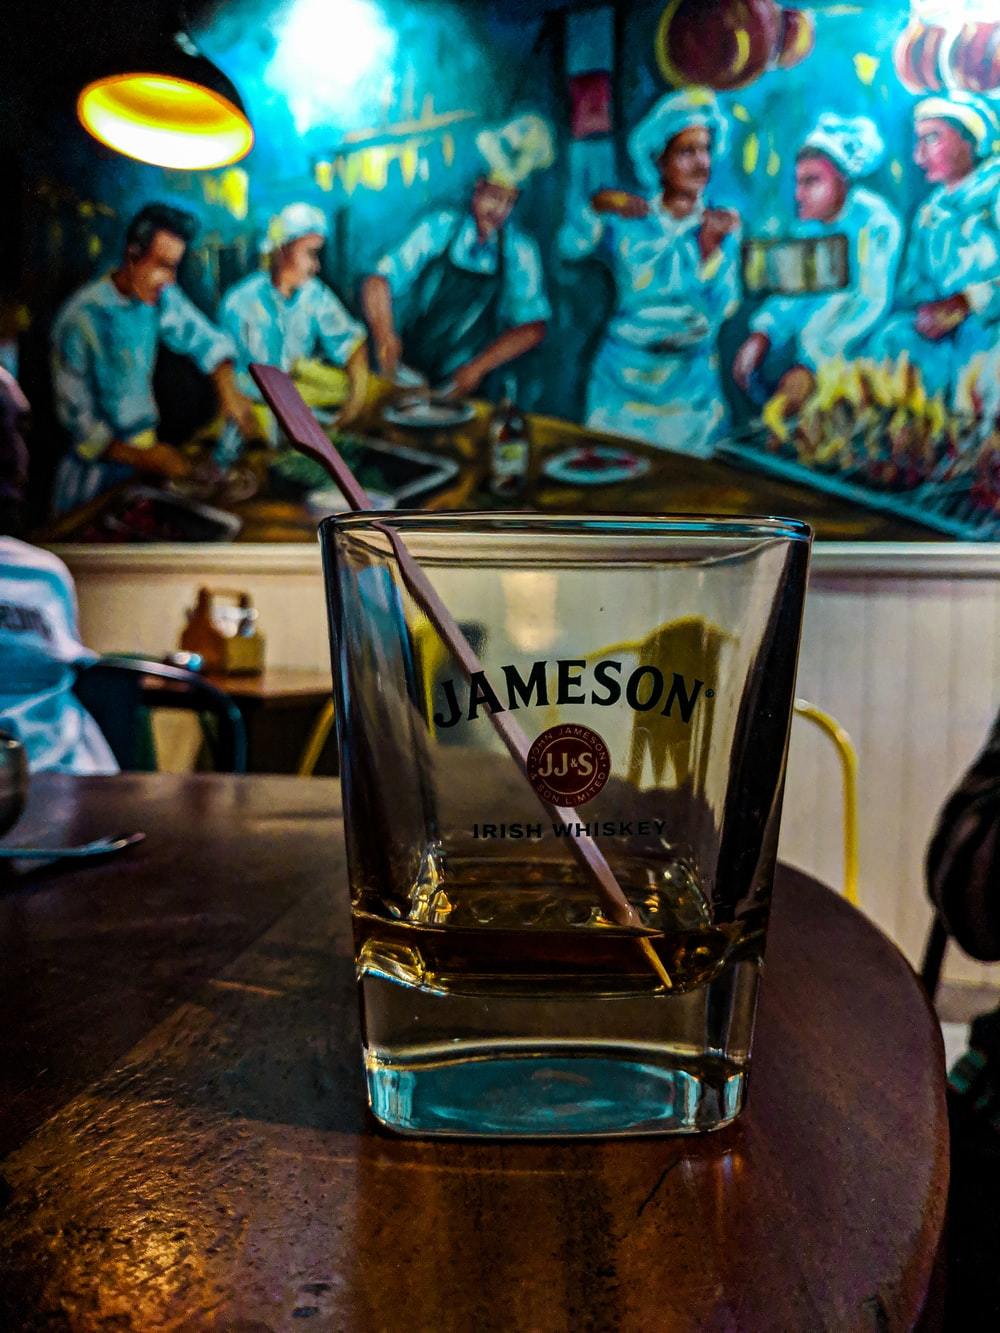 Jameson shot glass